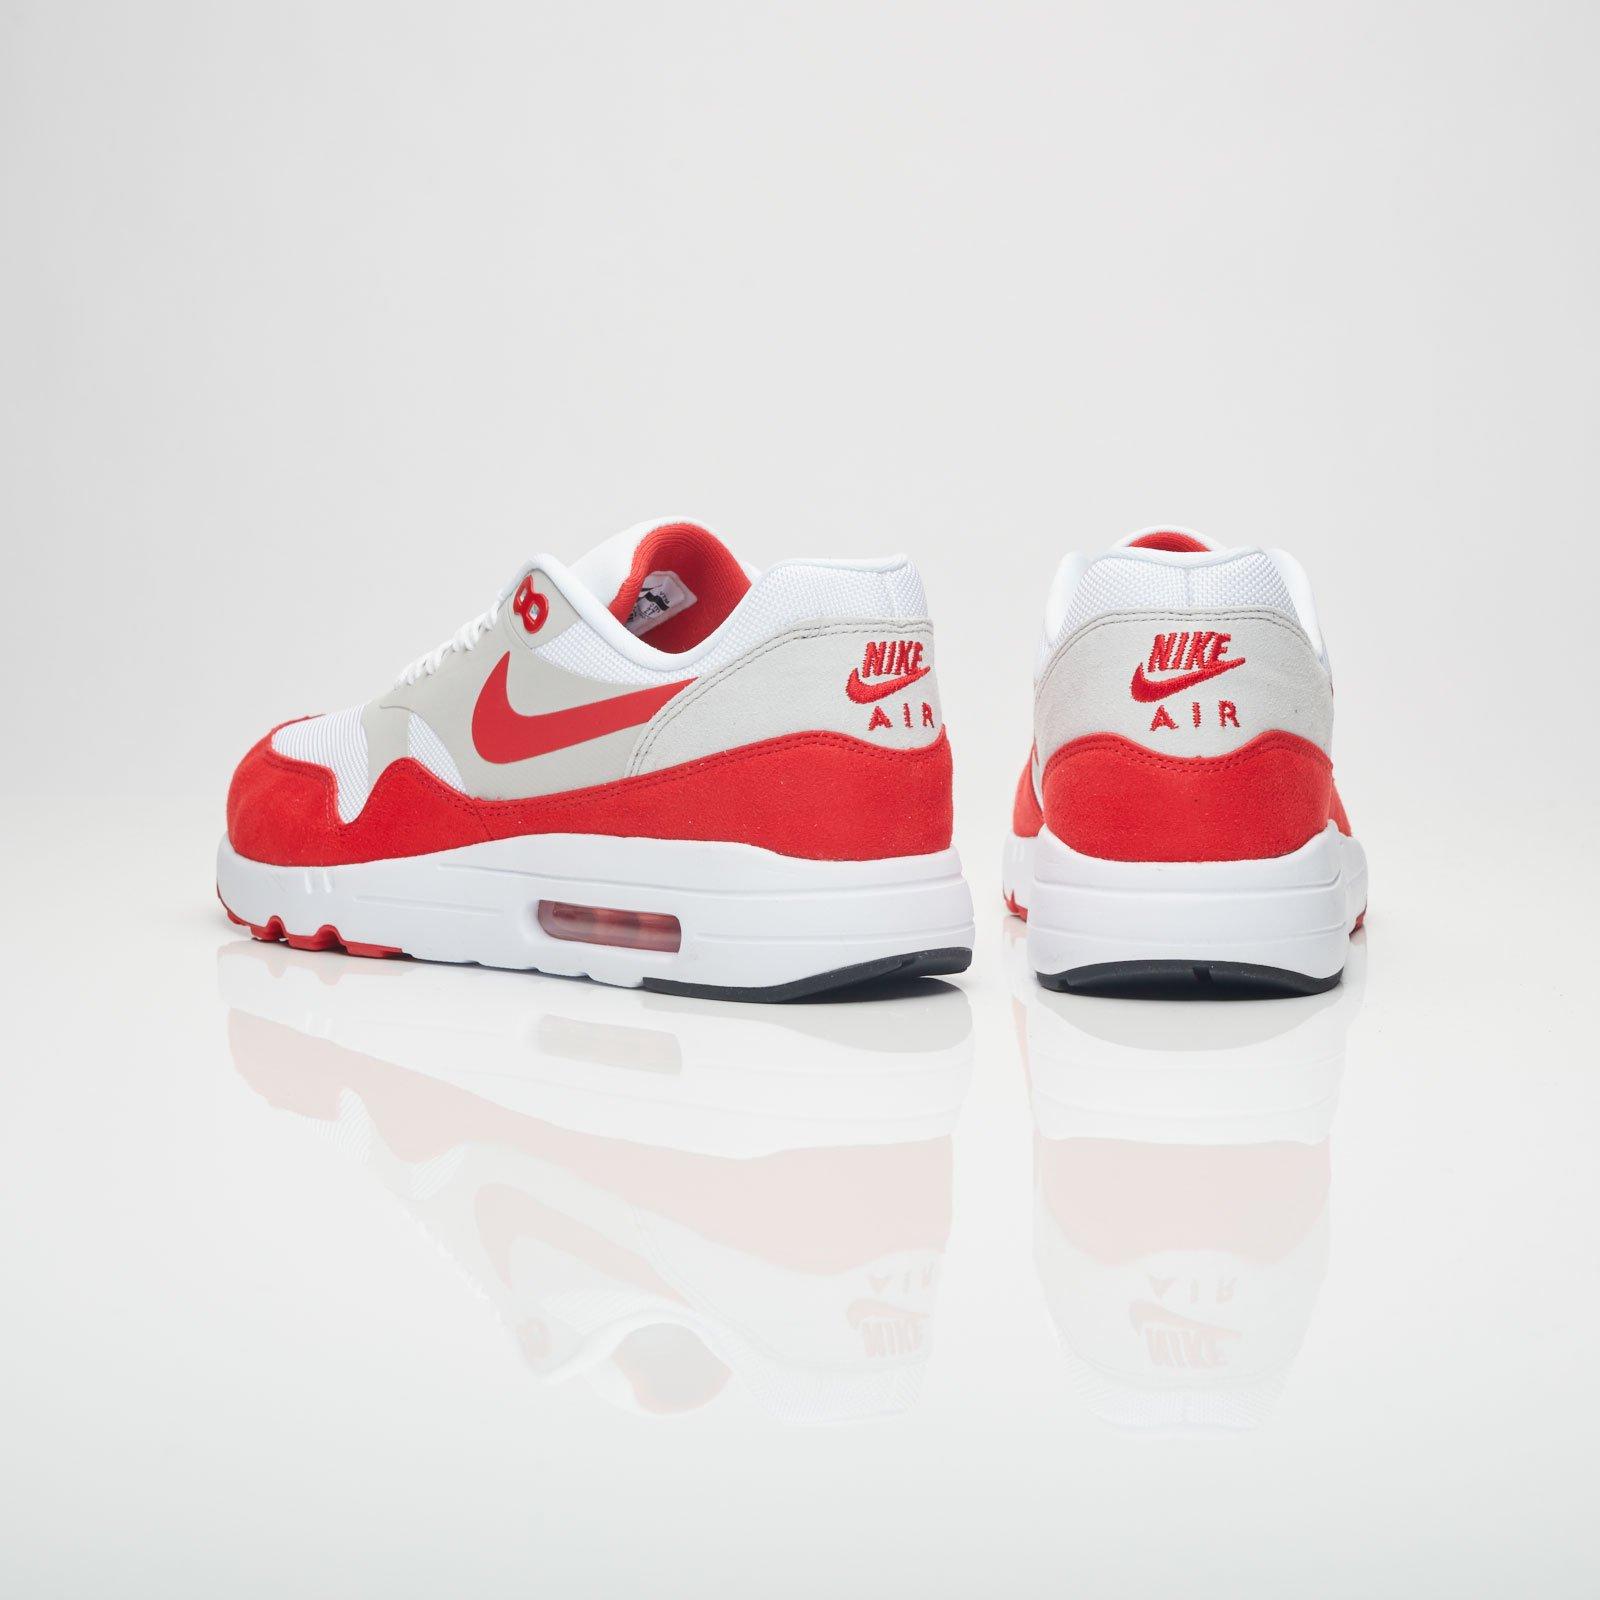 save off bdd15 294d3 Nike Air Max 1 Ultra 2.0 Le - 908091-100 - Sneakersnstuff   sneakers   streetwear  online since 1999